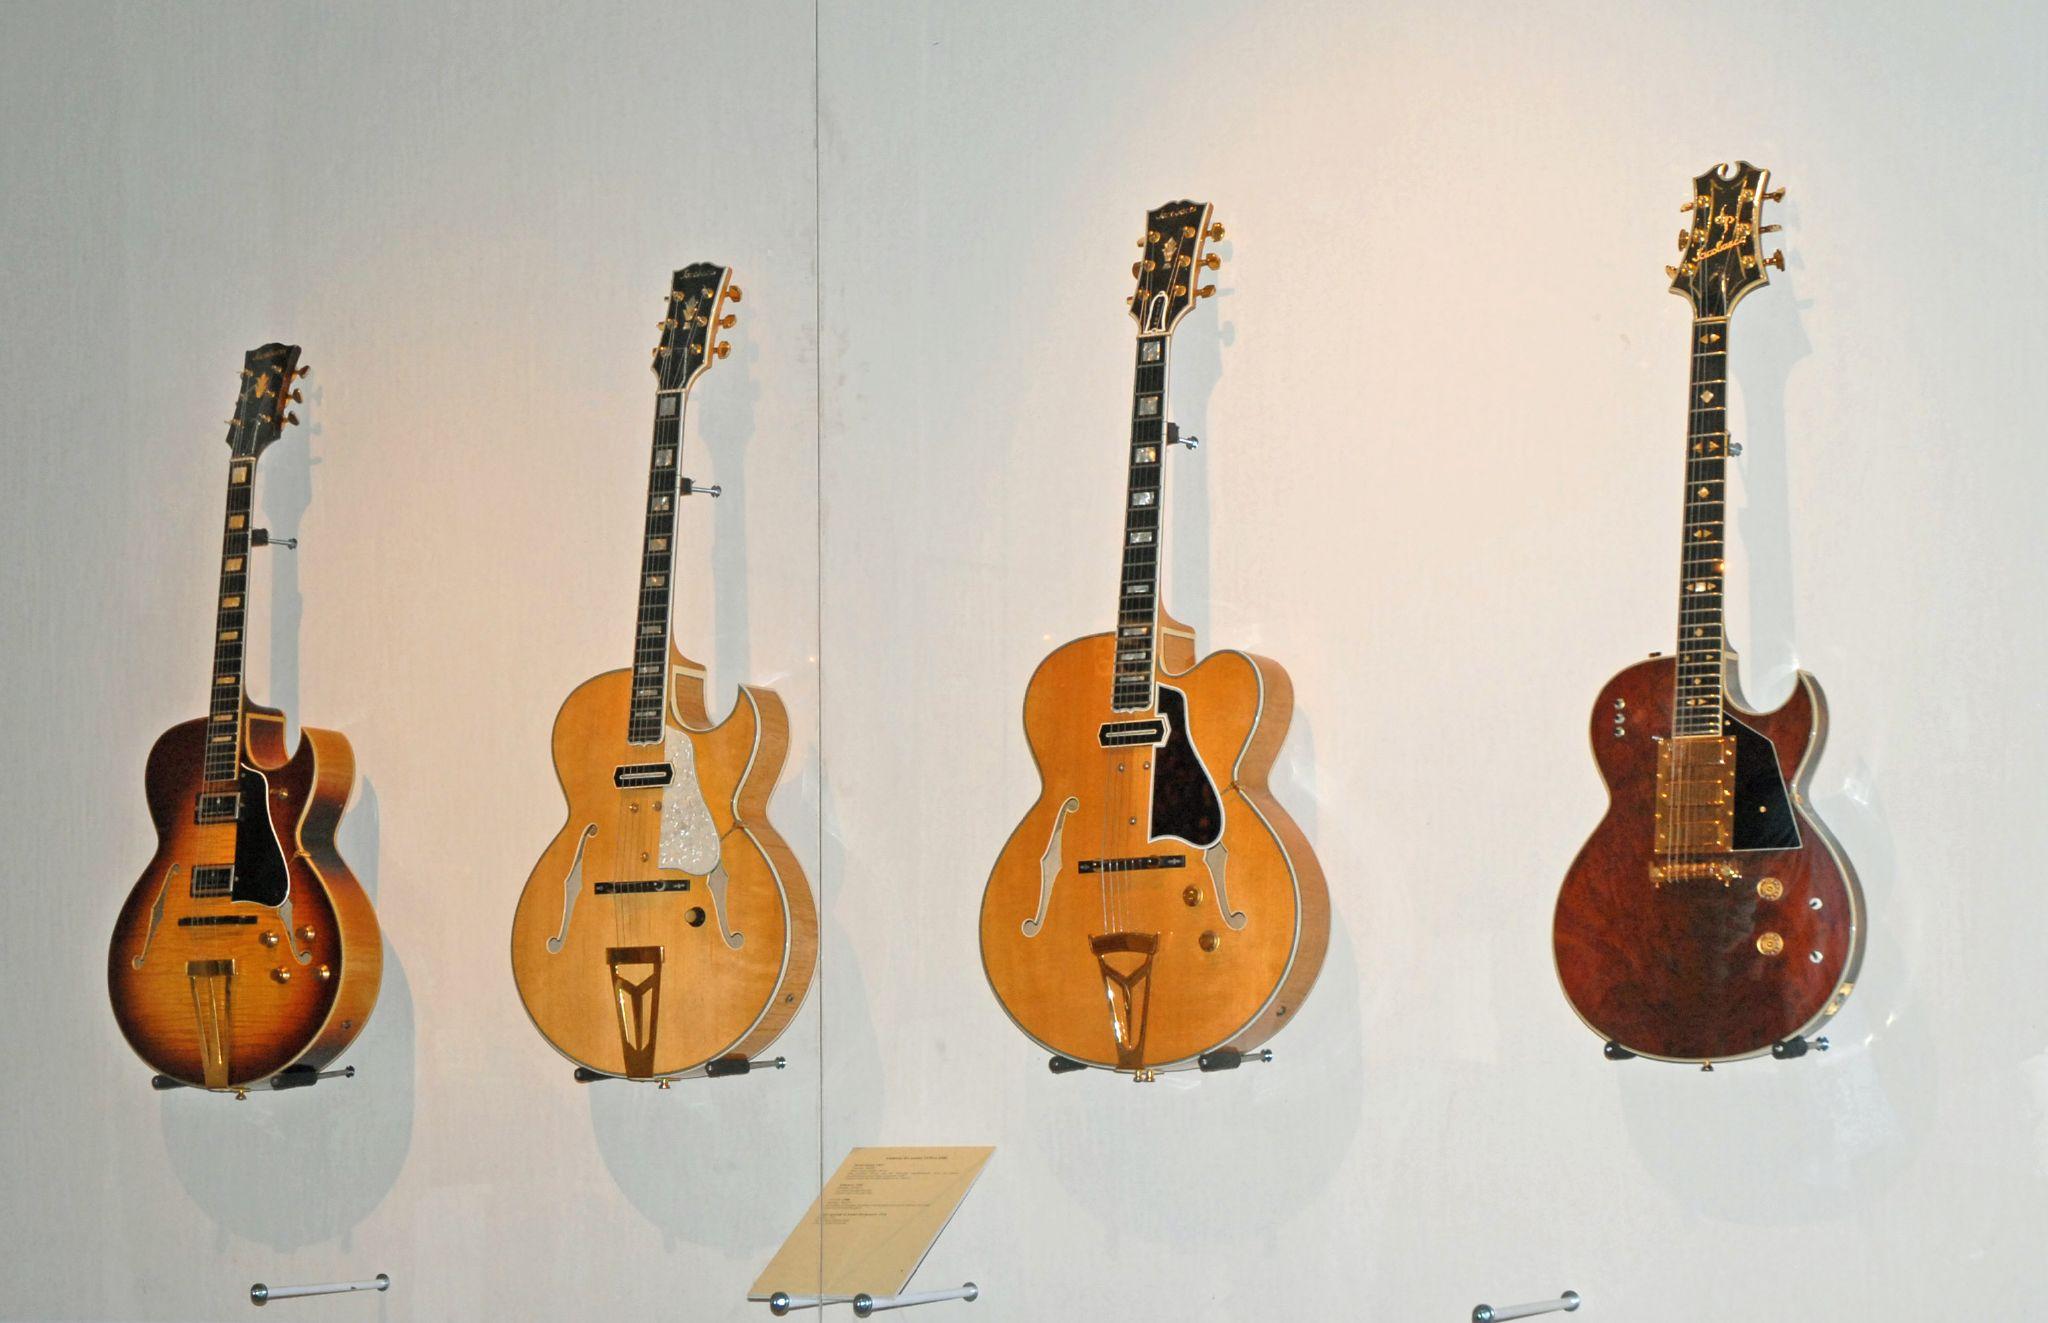 rencontres des guitares royales uranium 235 238 datant